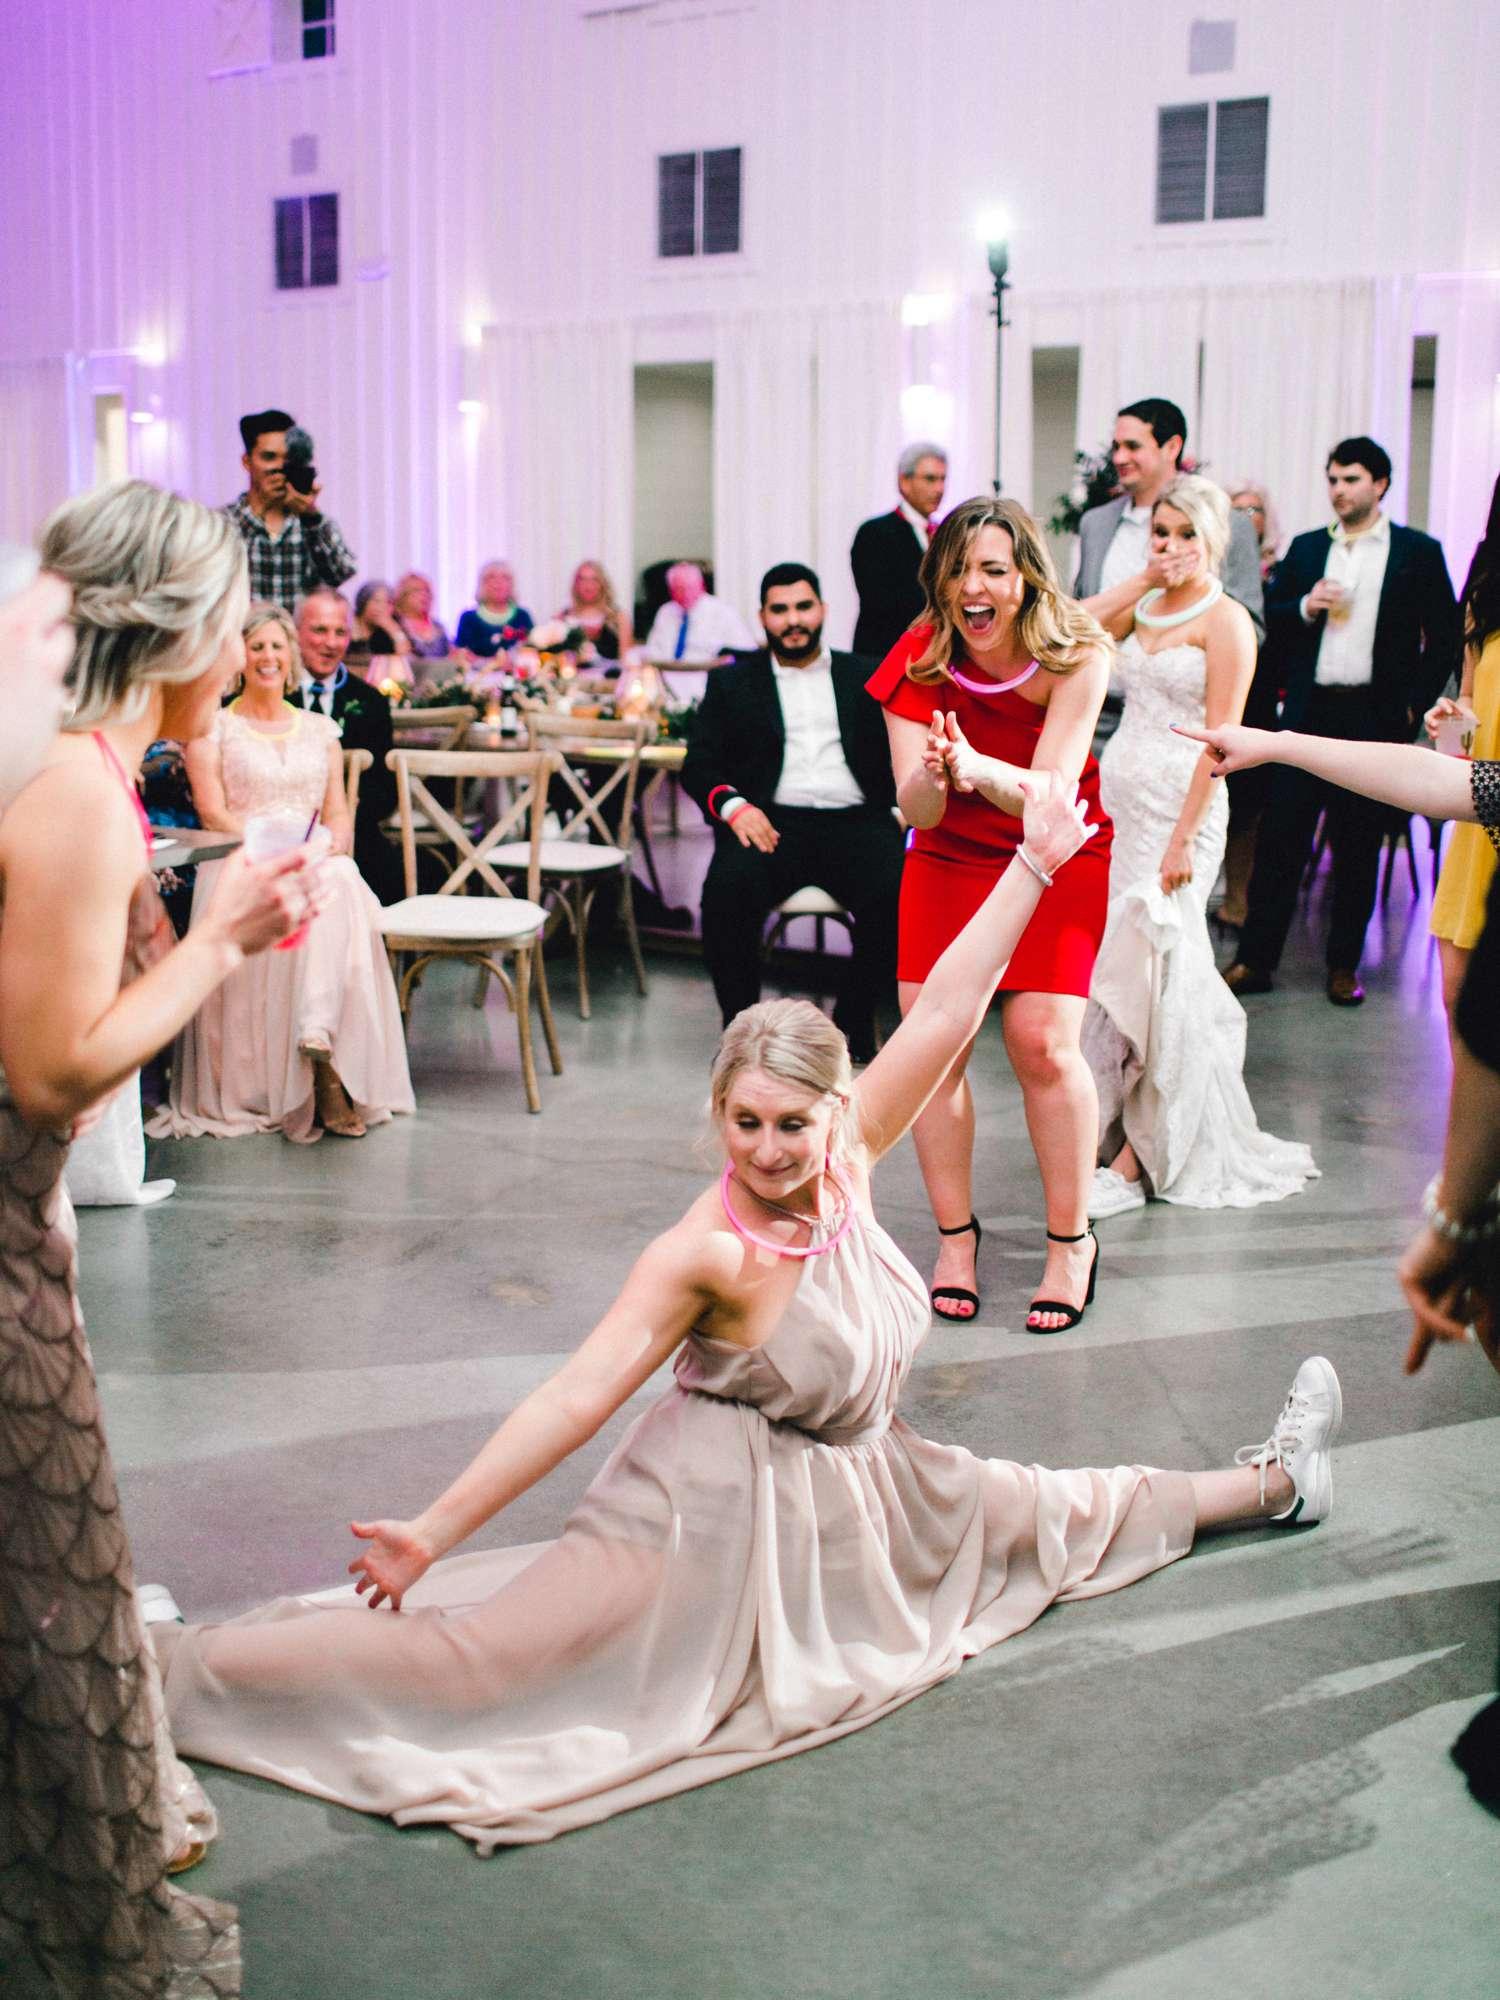 HEBERT_MORGAN_AND_CLAY_ALLEEJ_THE_FARMHOUSE_MONTGOMERY_TEXAS_WEDDING_0233.jpg